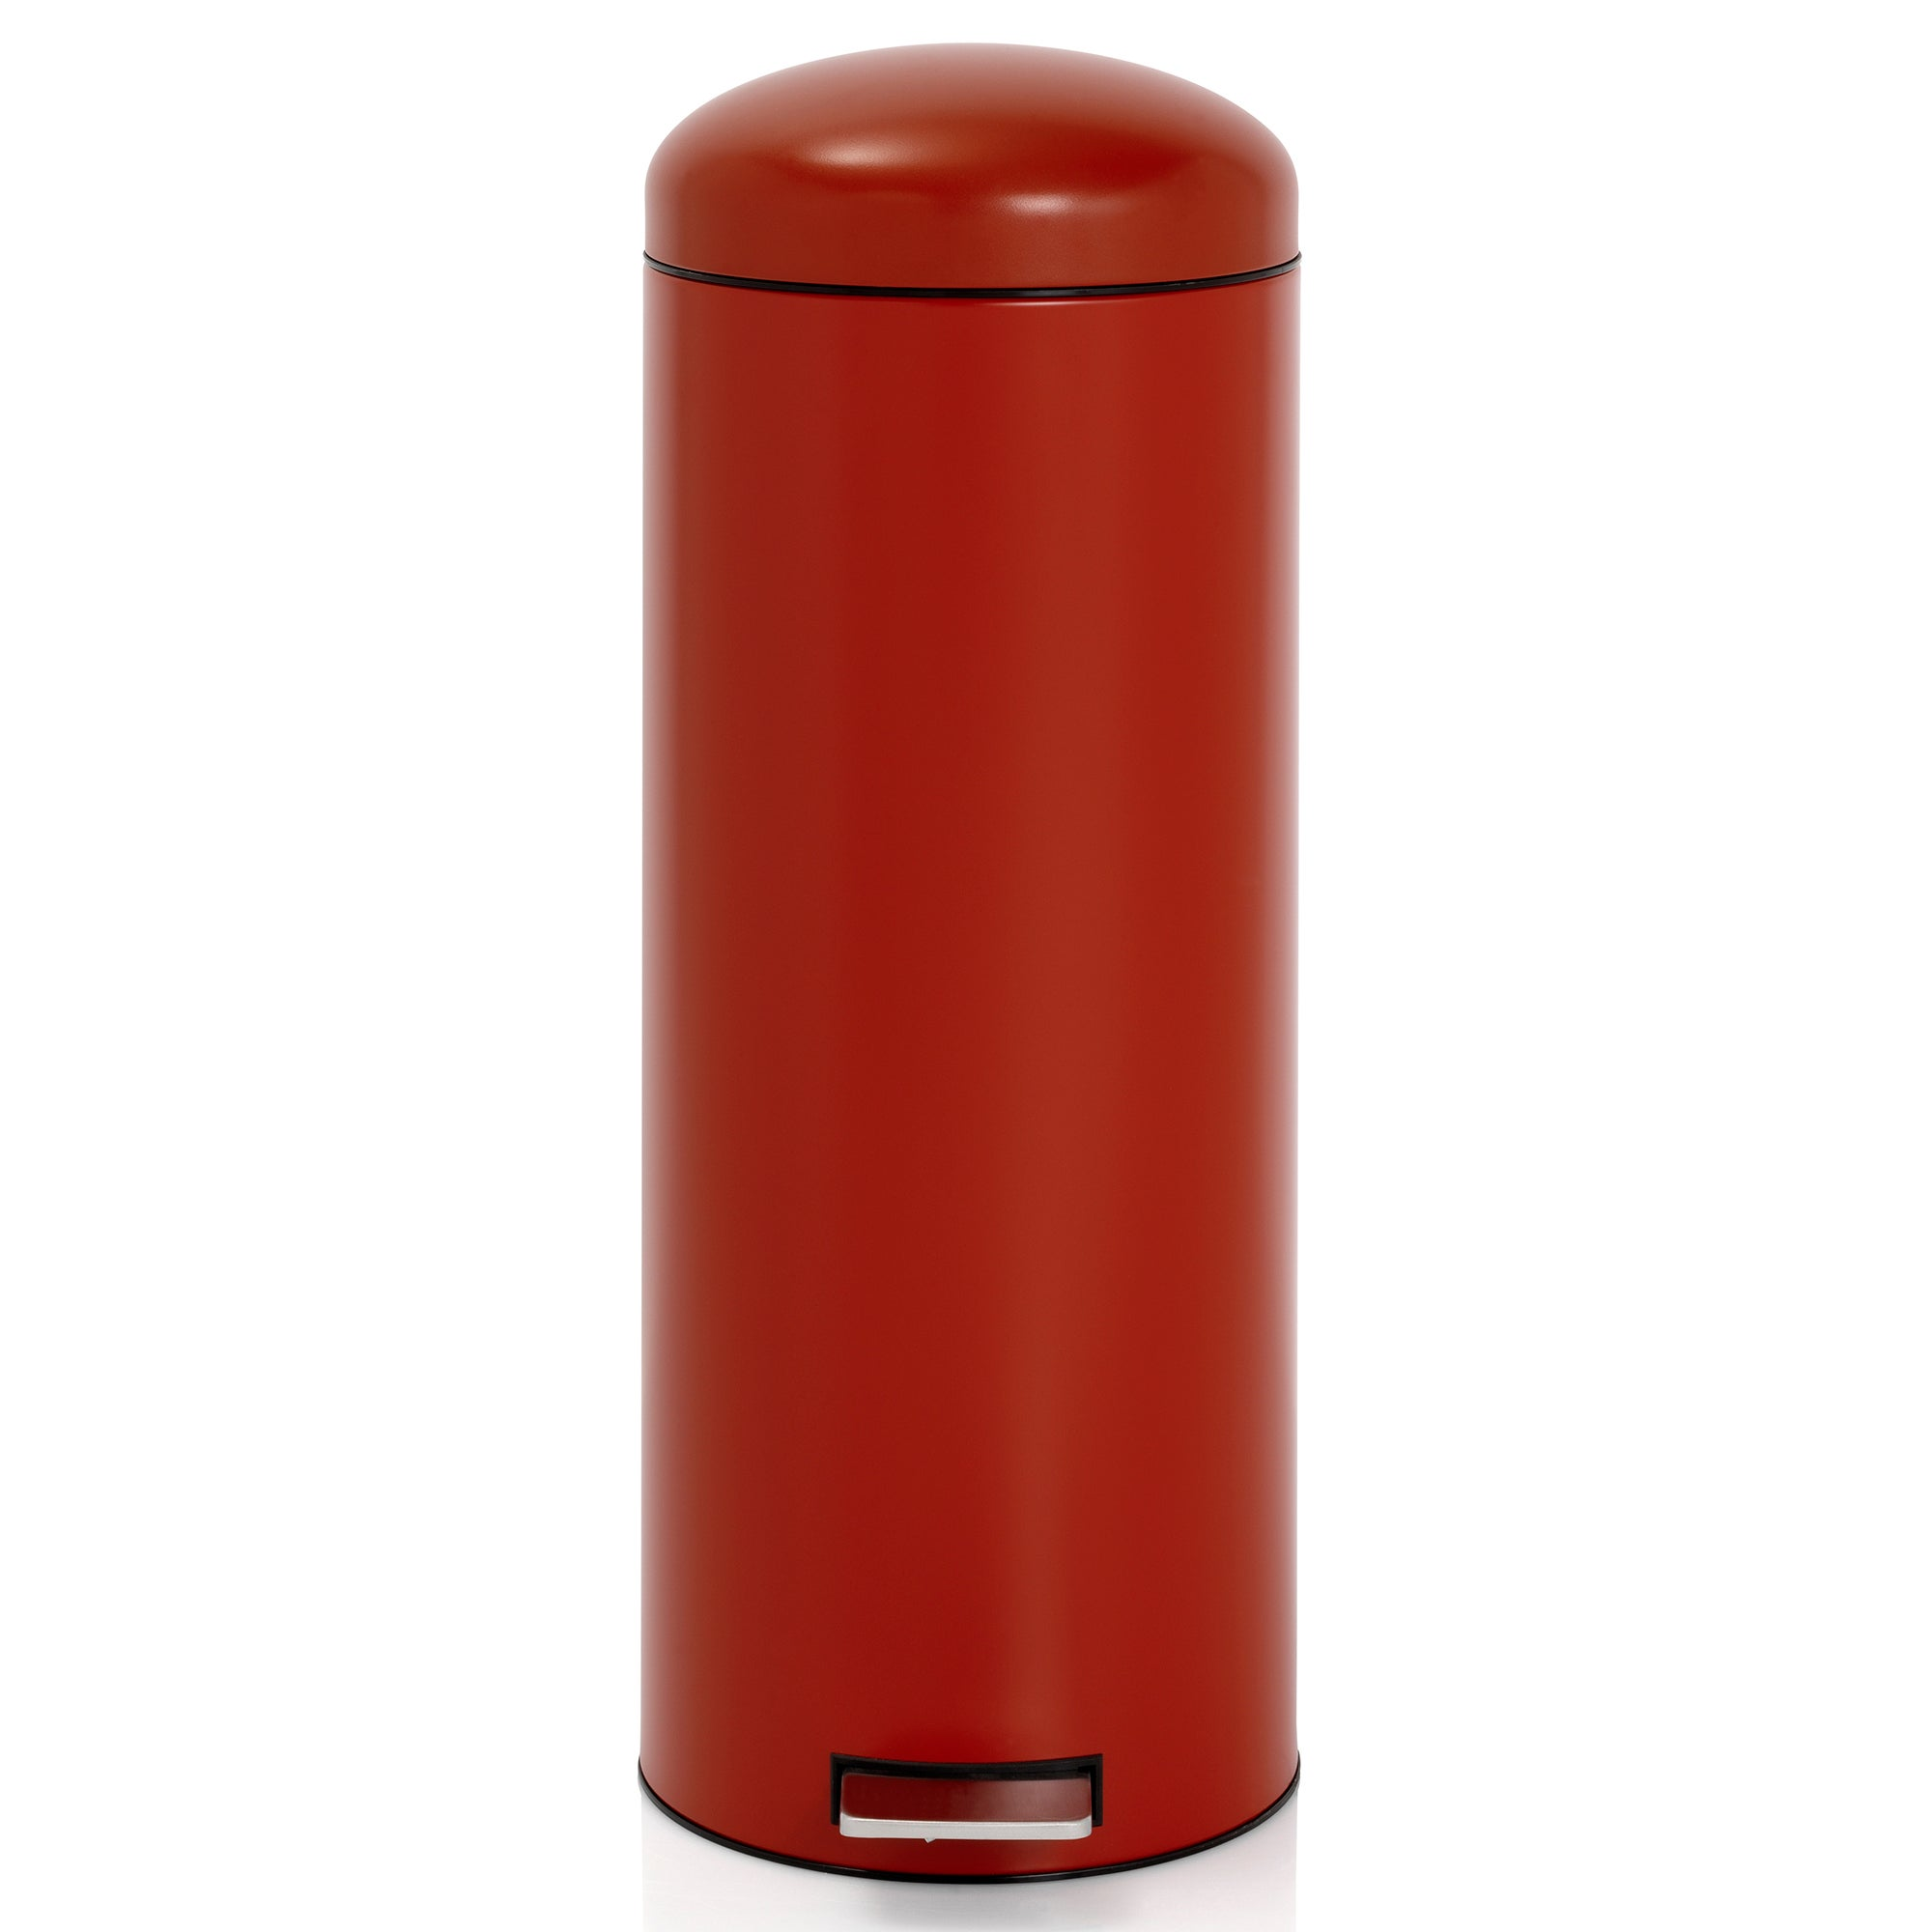 Brabantia Deep Red 20 Litre Retro Pedal Bin